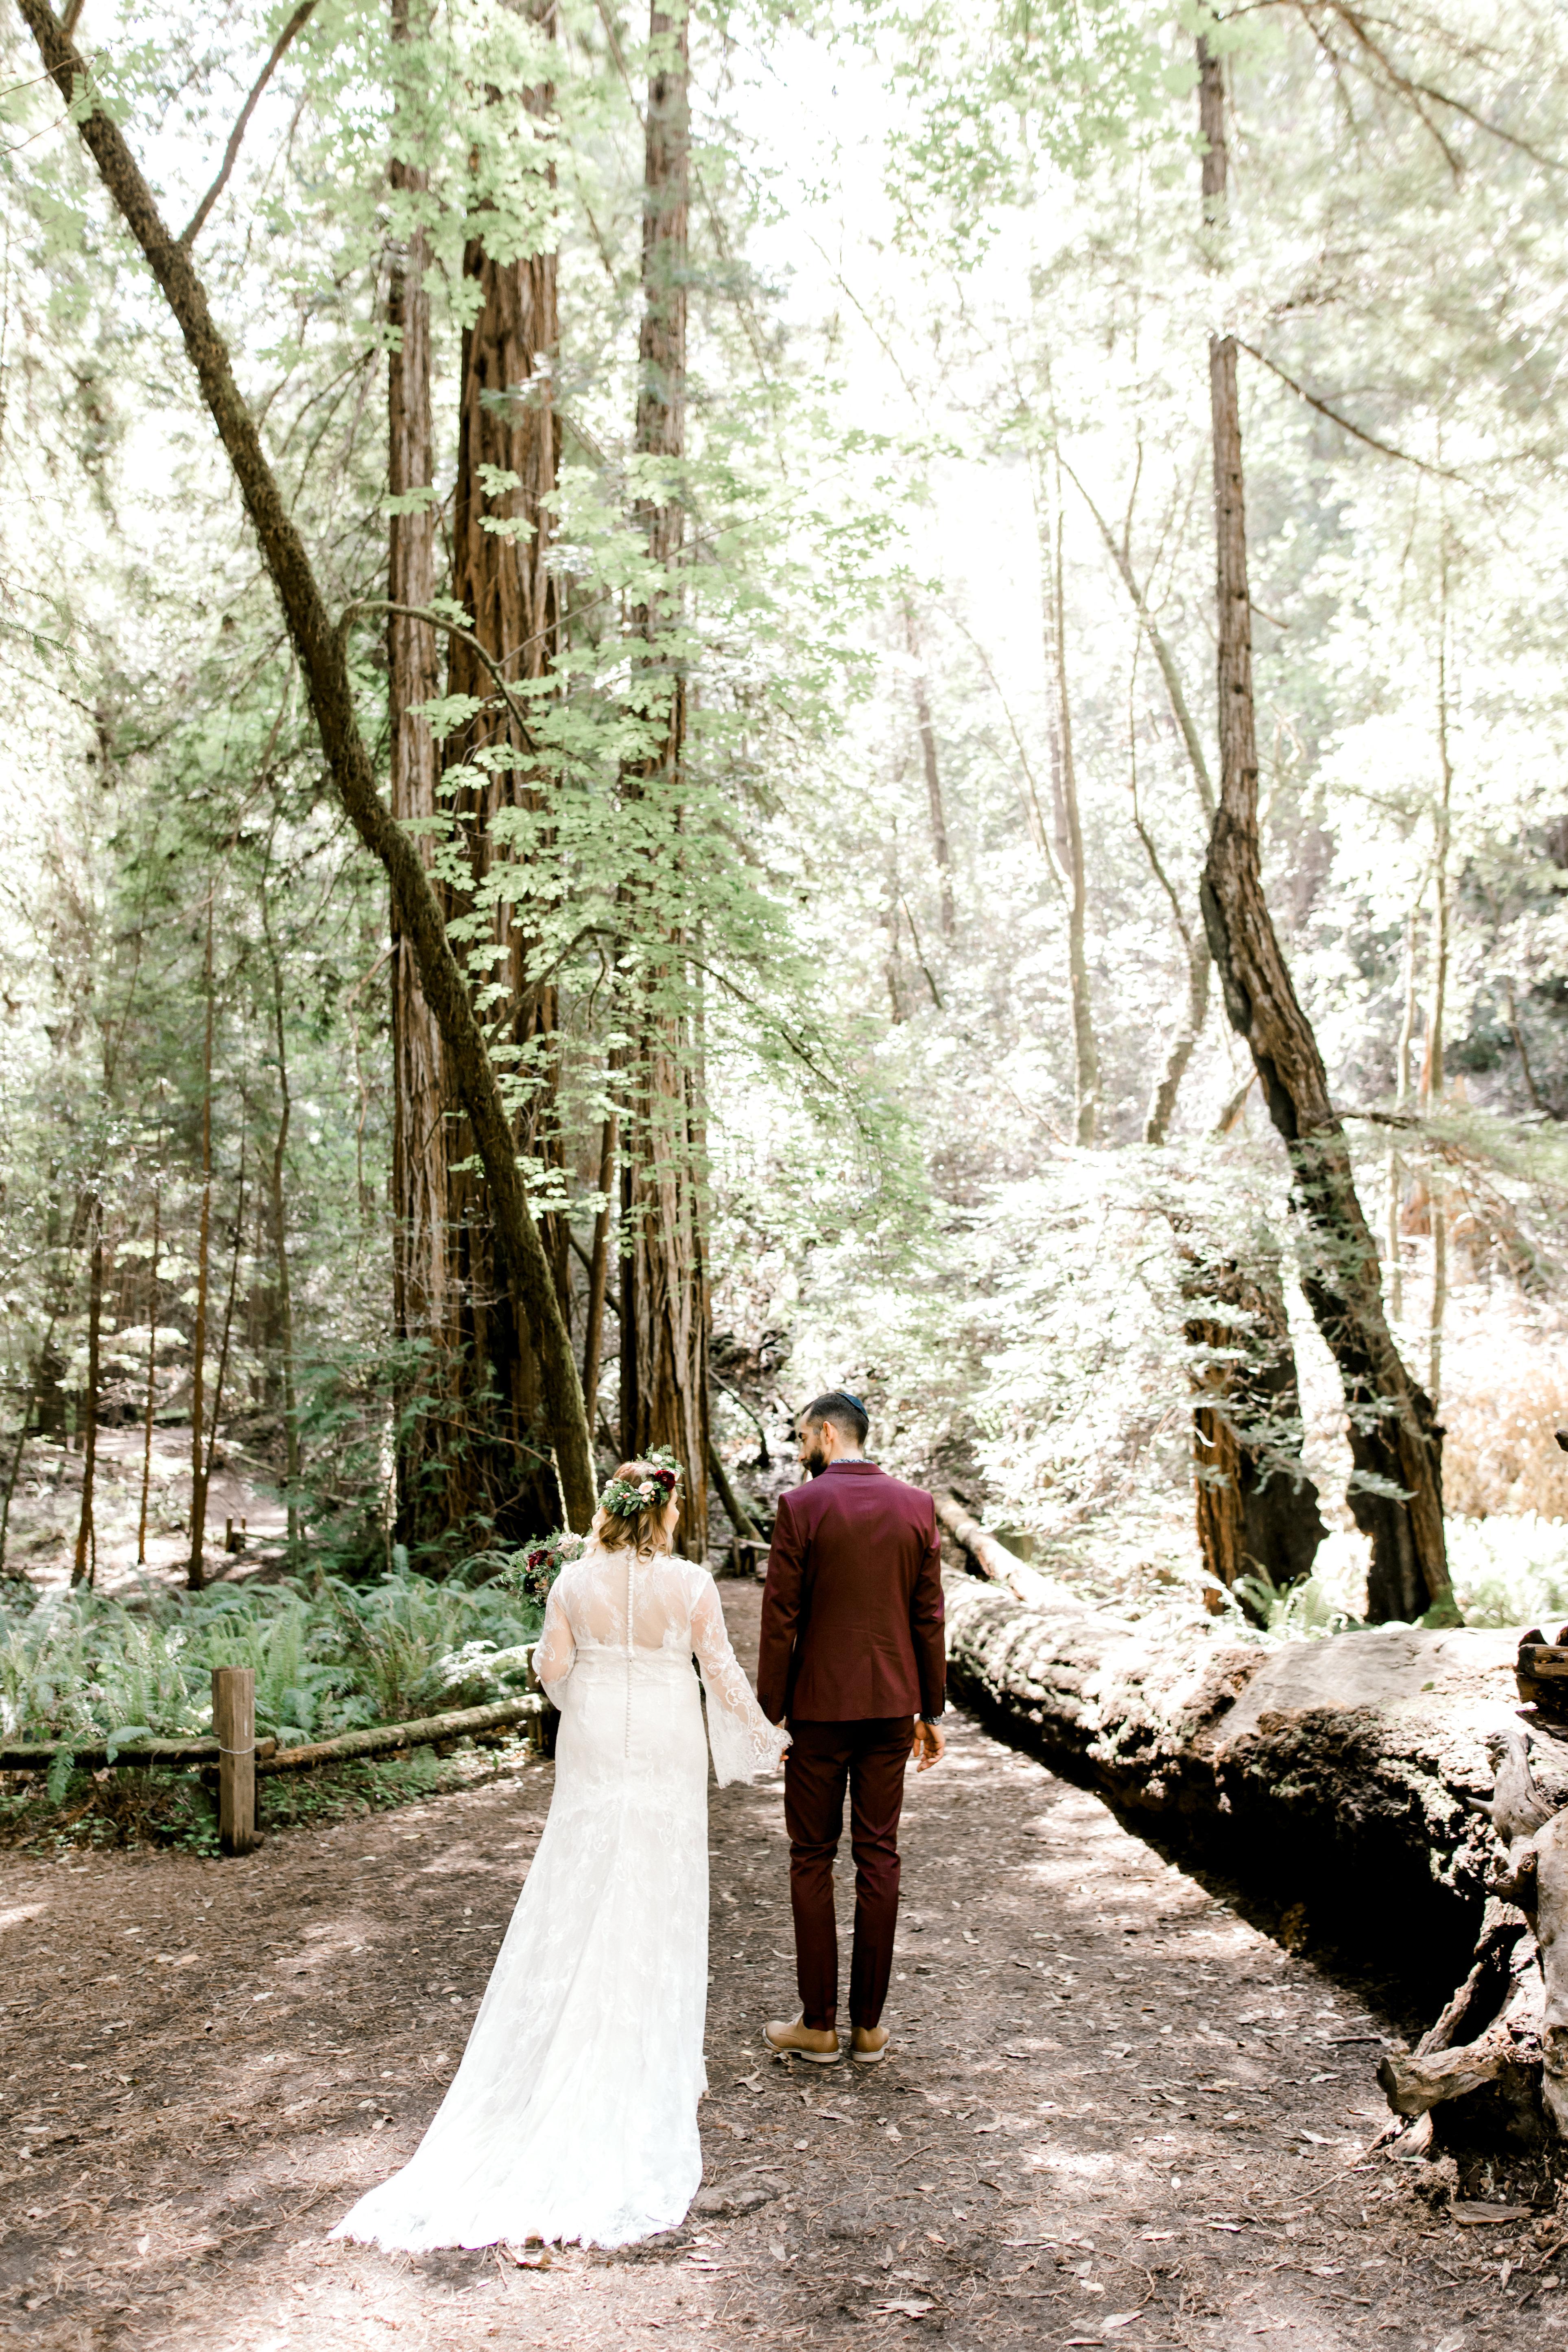 Natalia and Adam Wedding - 4.21.18 - Sam Areman Photo 161195_